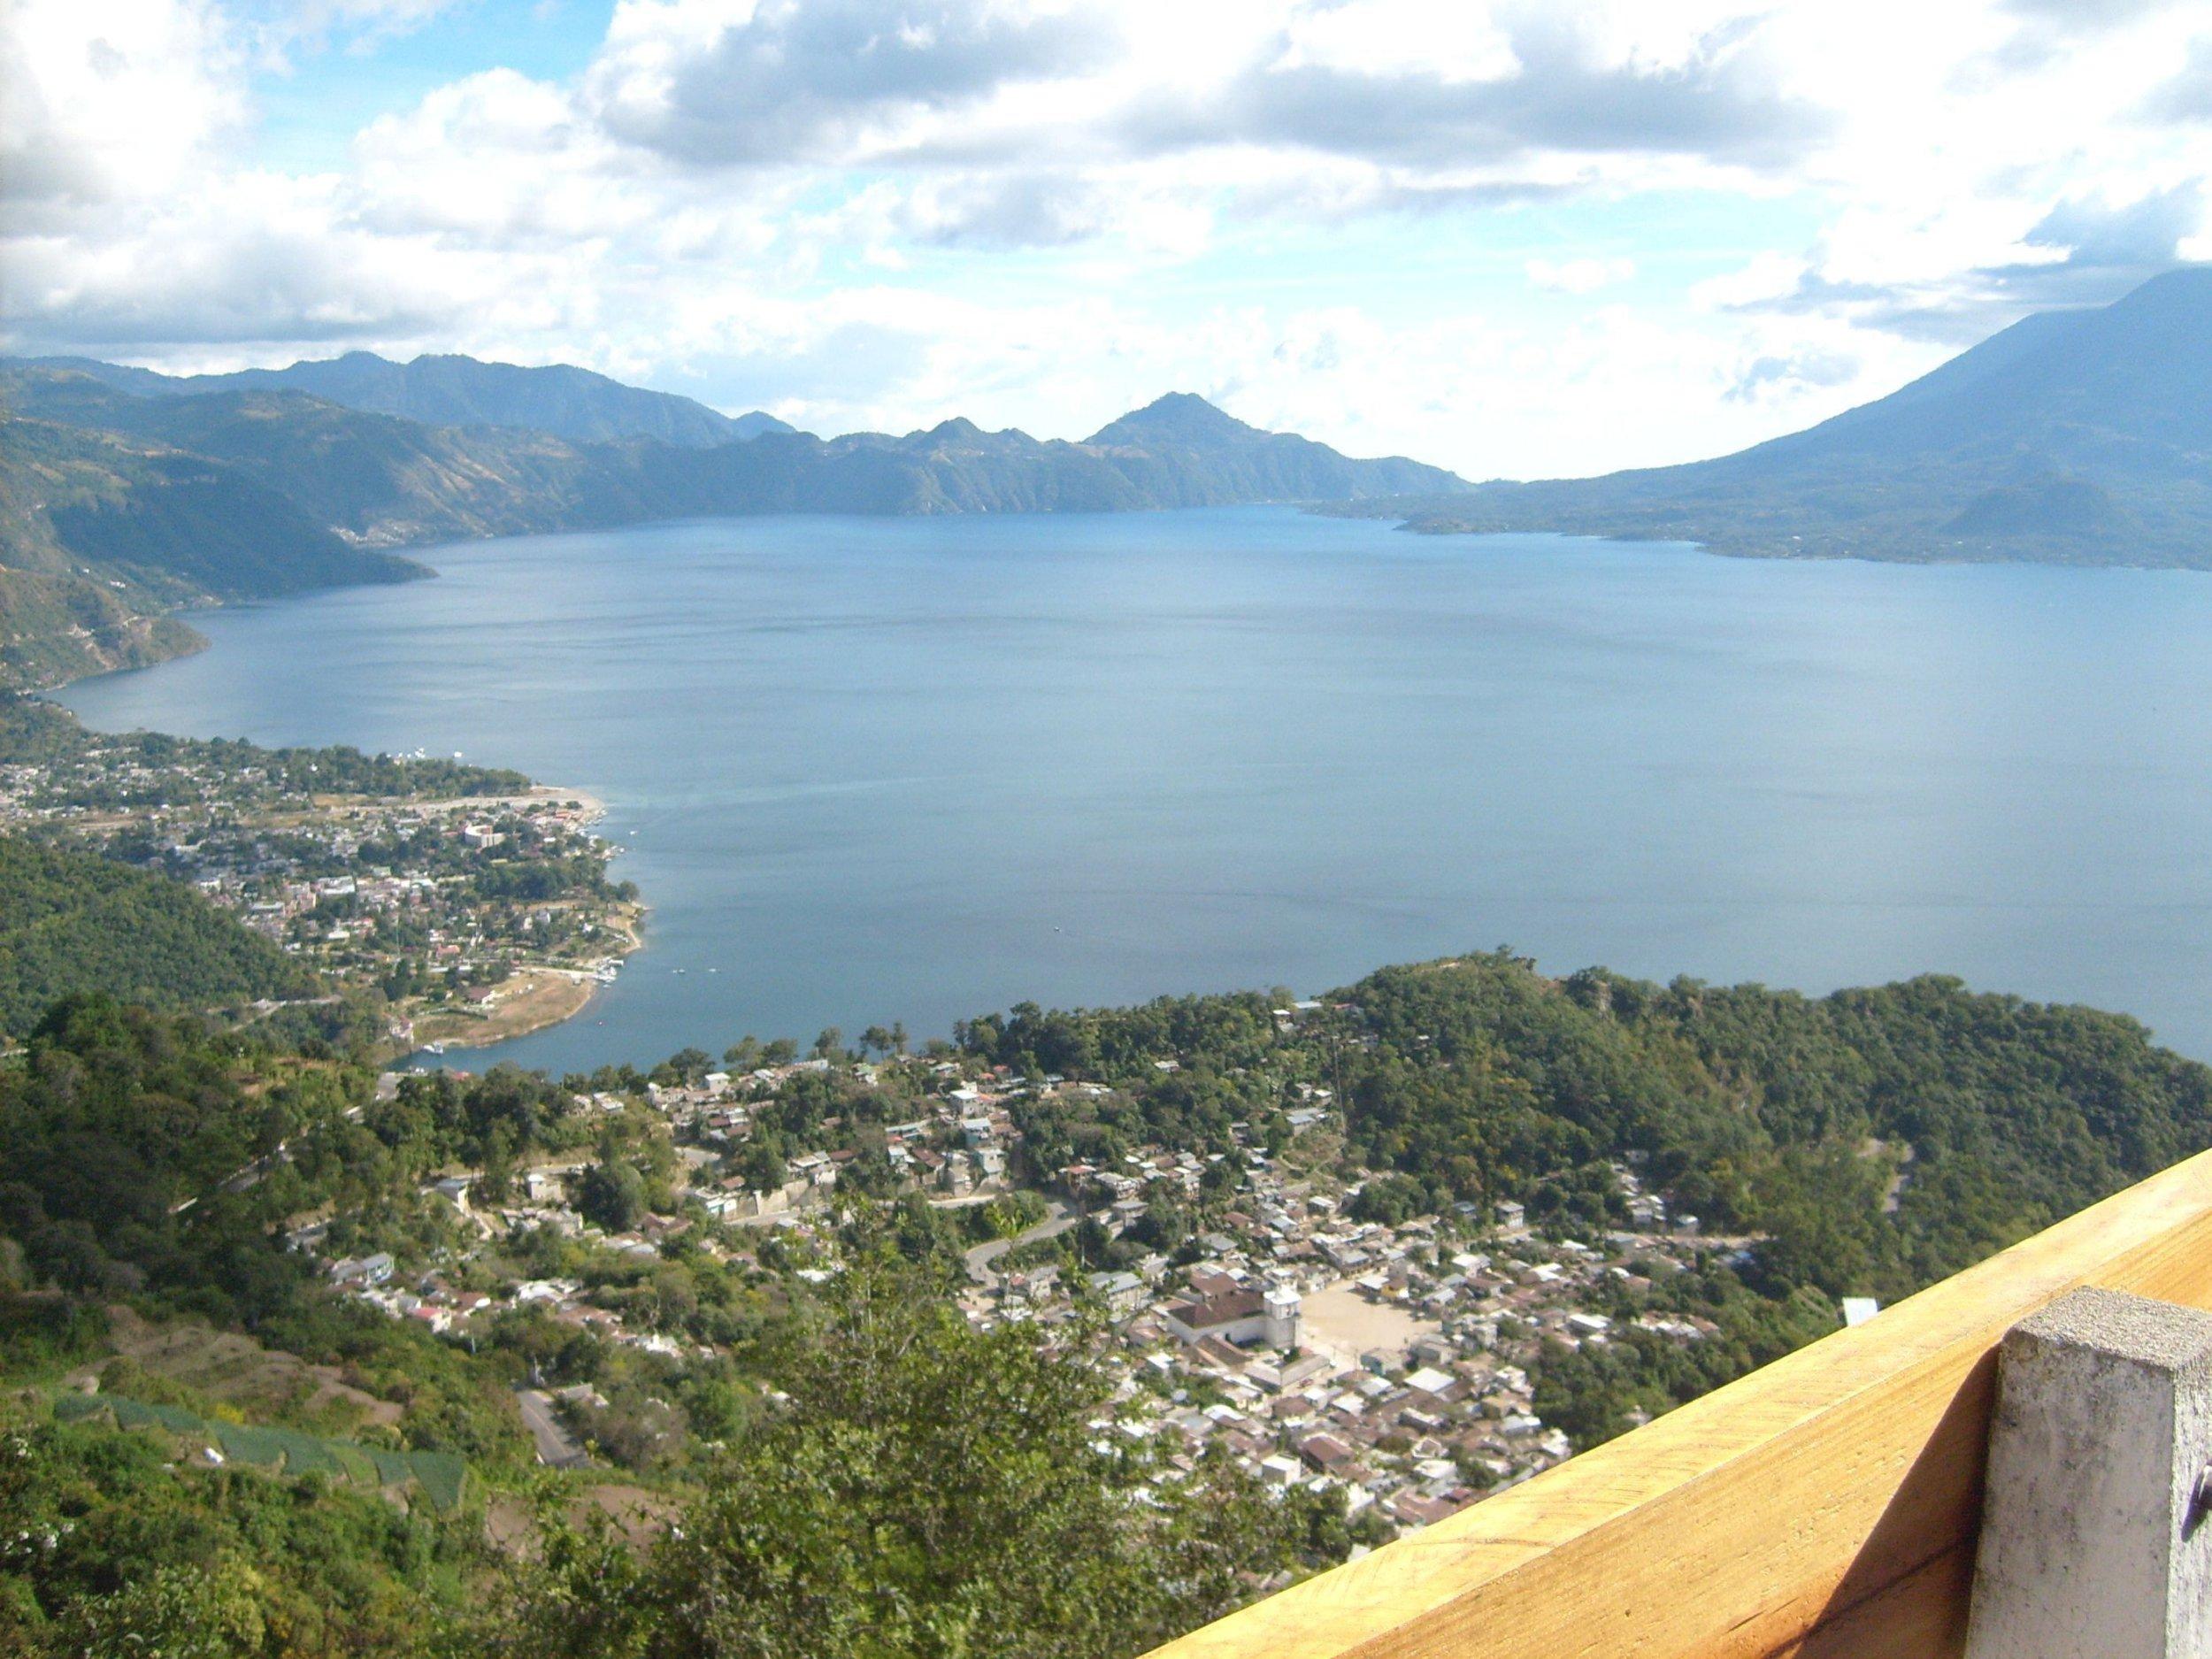 lake Atitlan and town of Panajachel seen from neighboring mountain